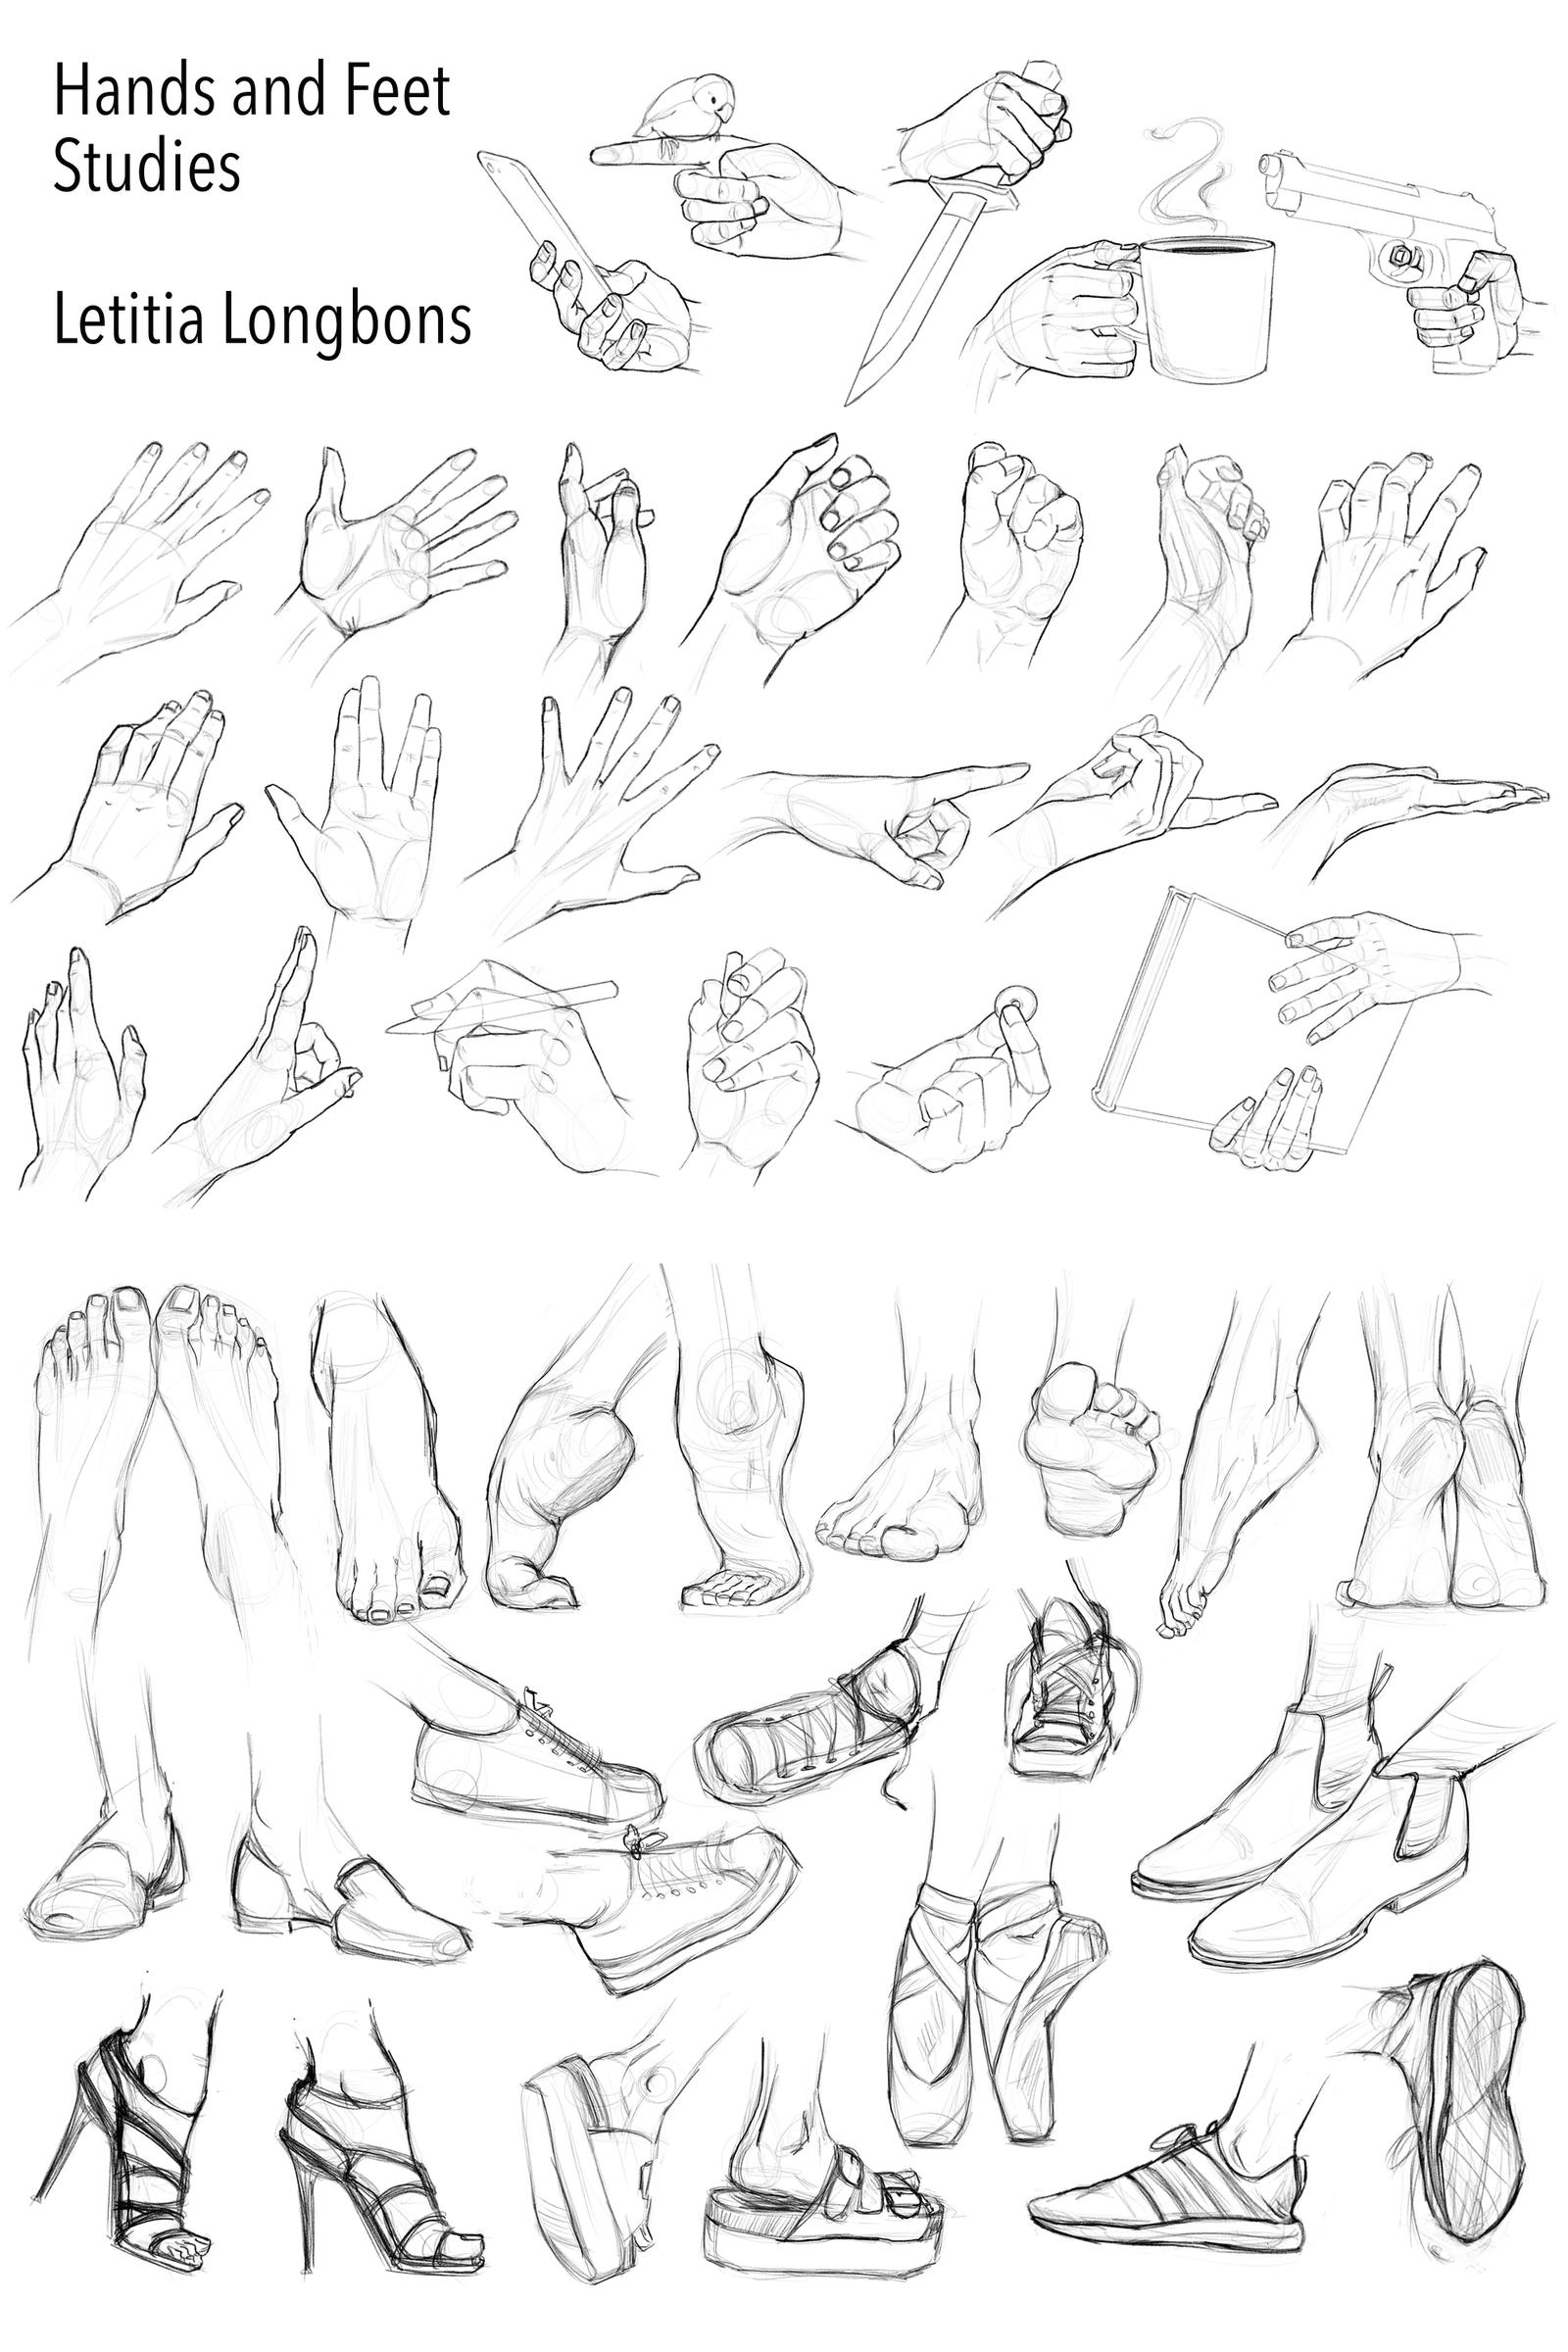 Hands and Feet Studies